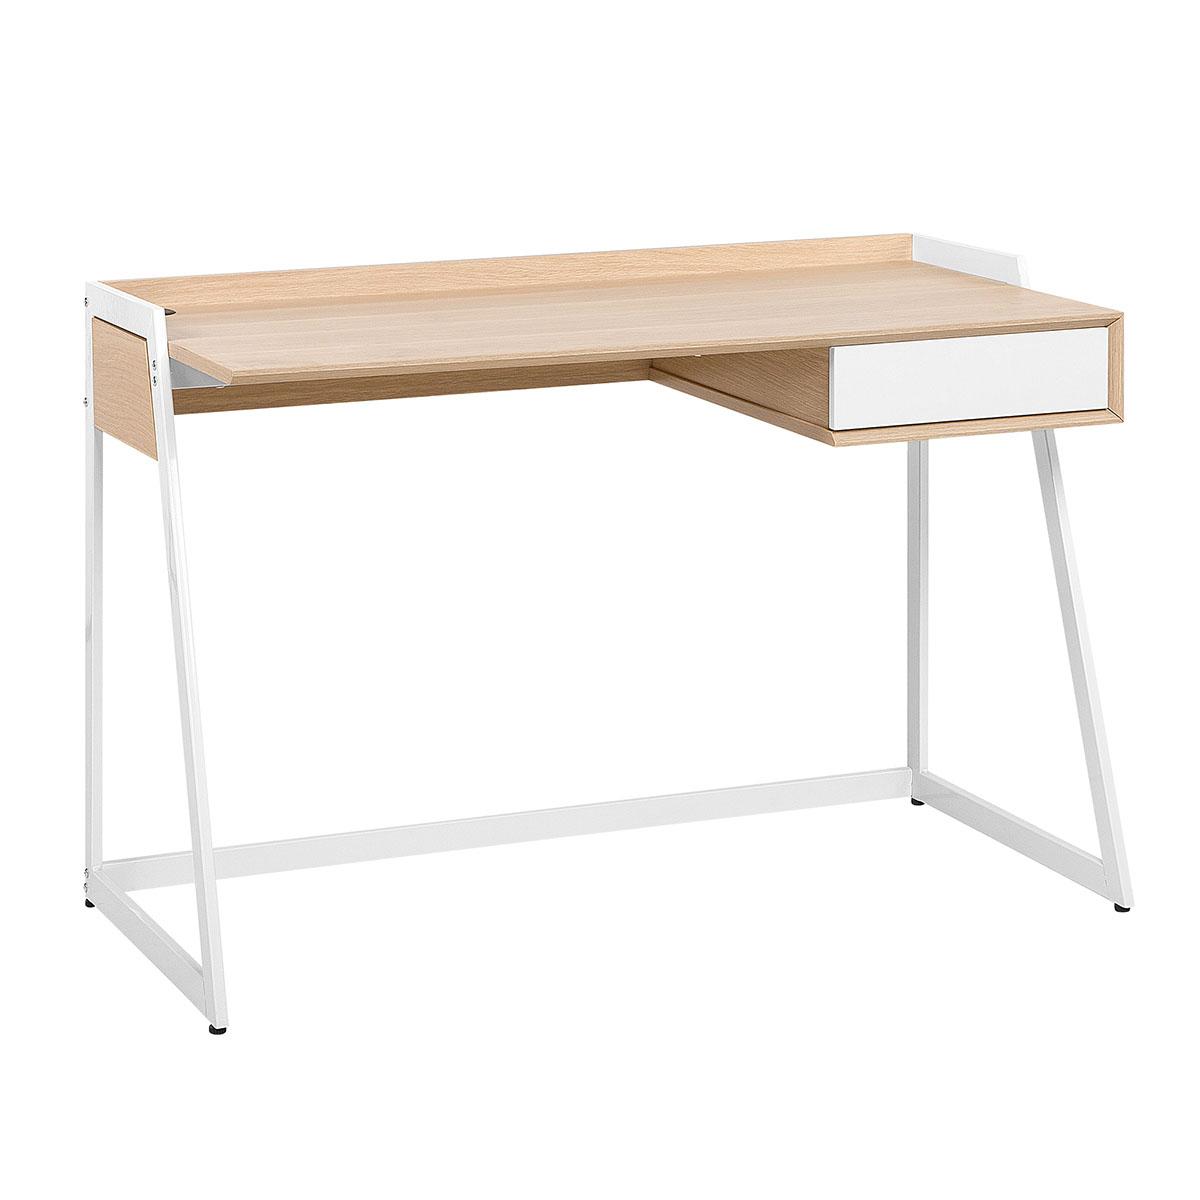 Biurko białe/jasne drewno 120 x 60 cm QUITO